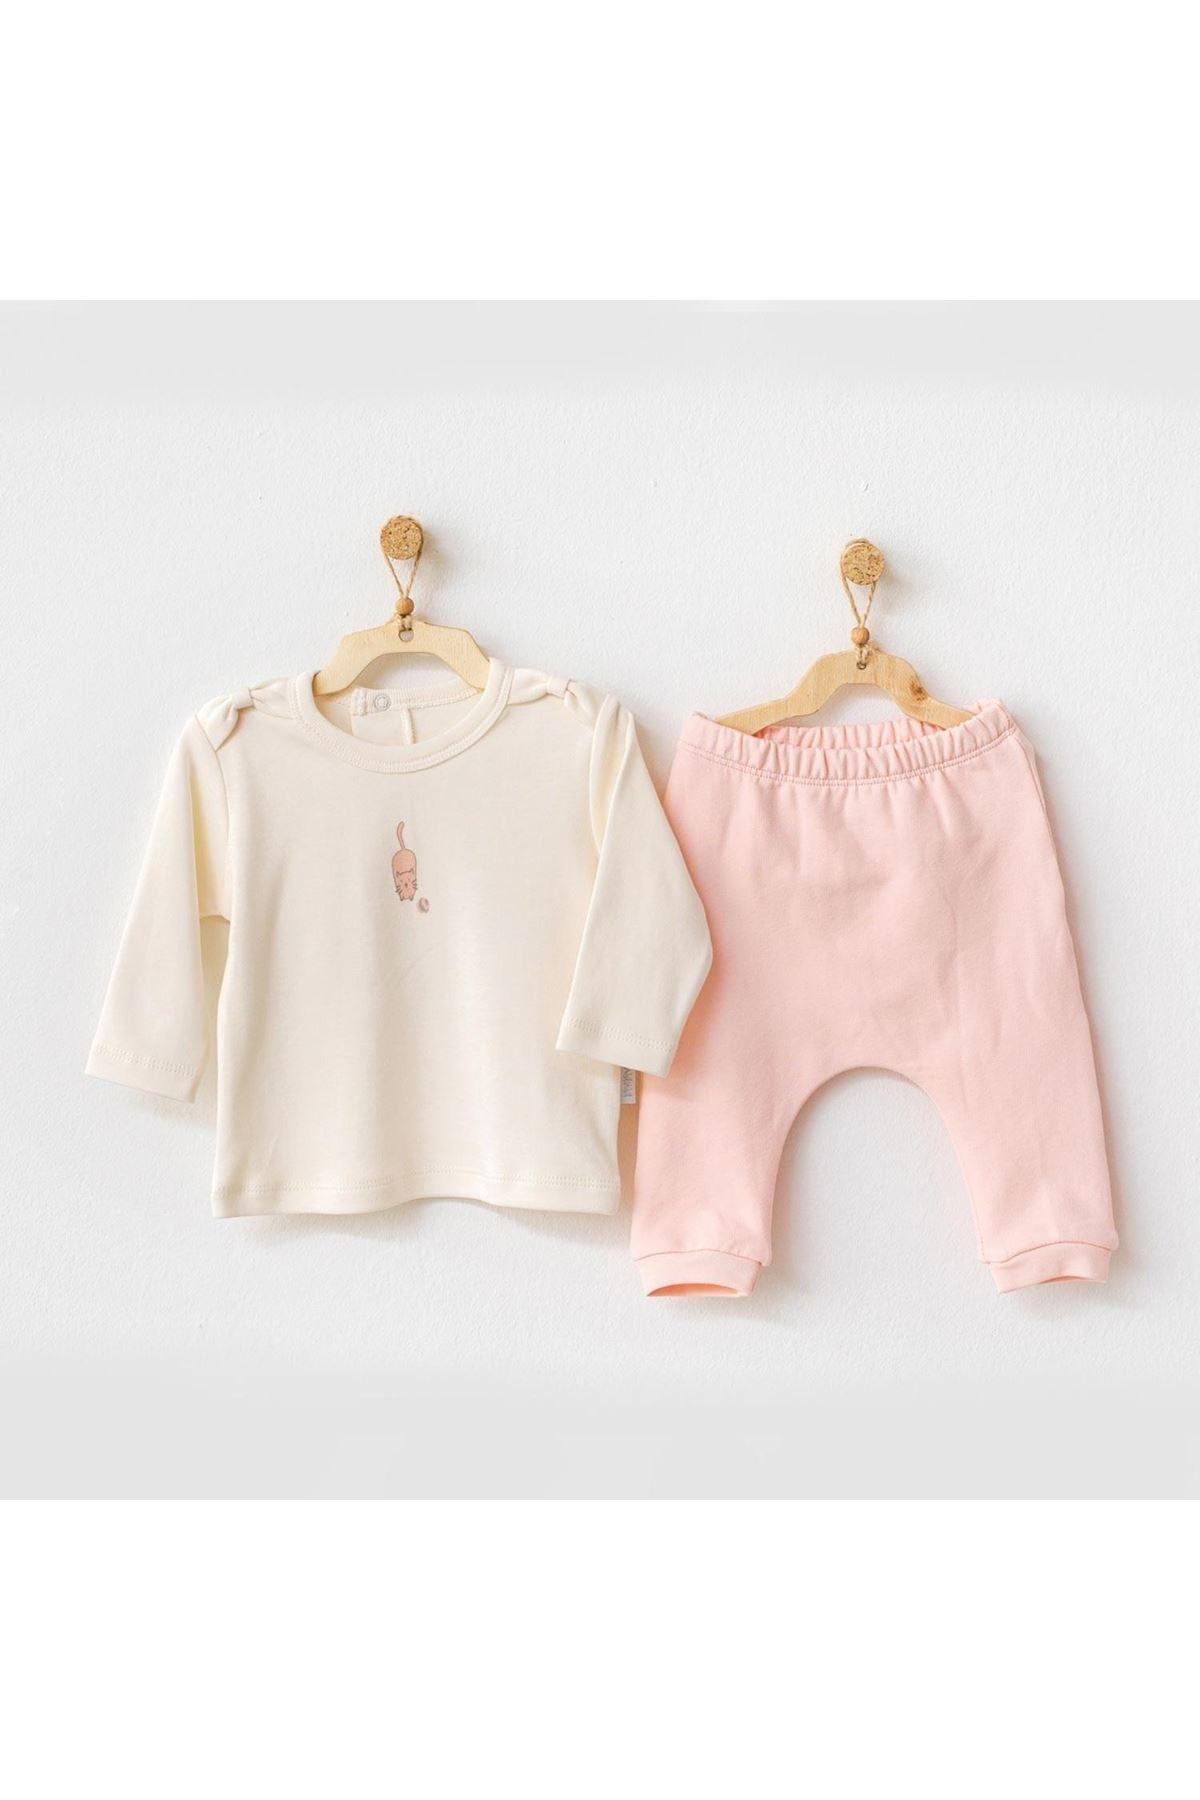 Andywawa AC21112 Meow 2li Bebek Takım Pink